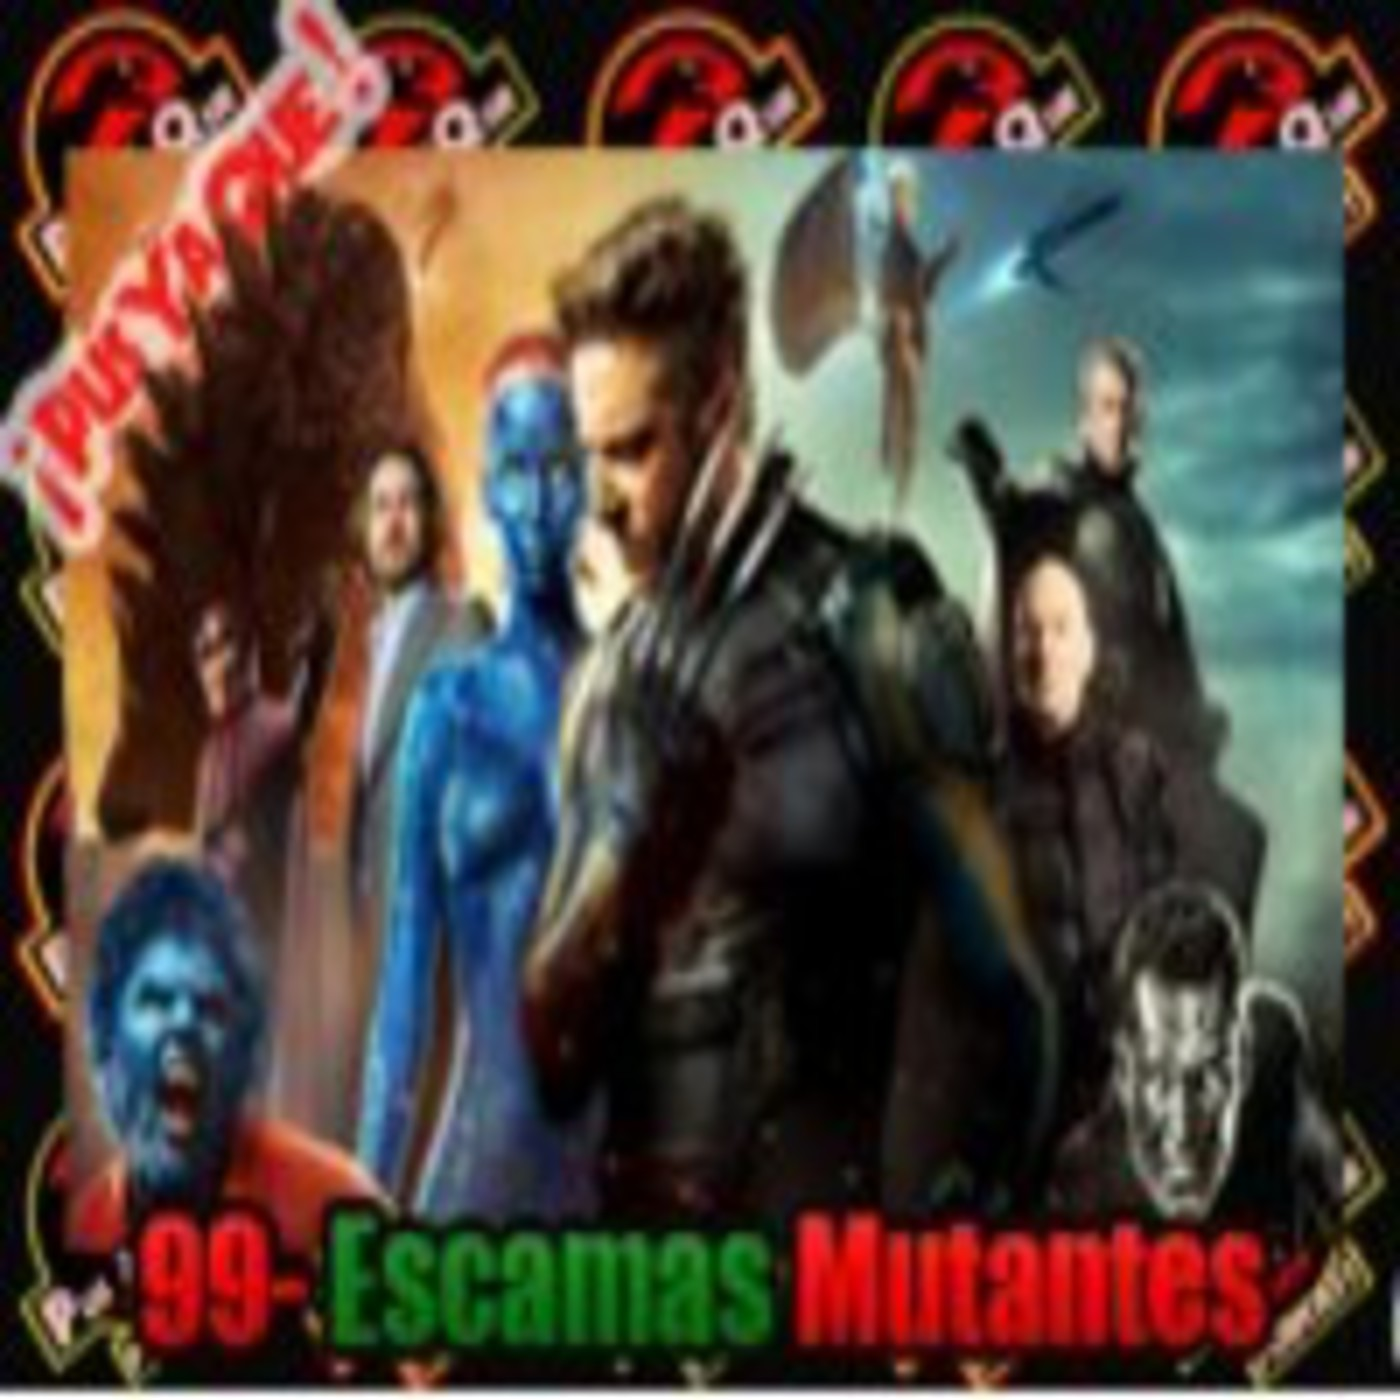 PYQ 99- Escamas Mutantes